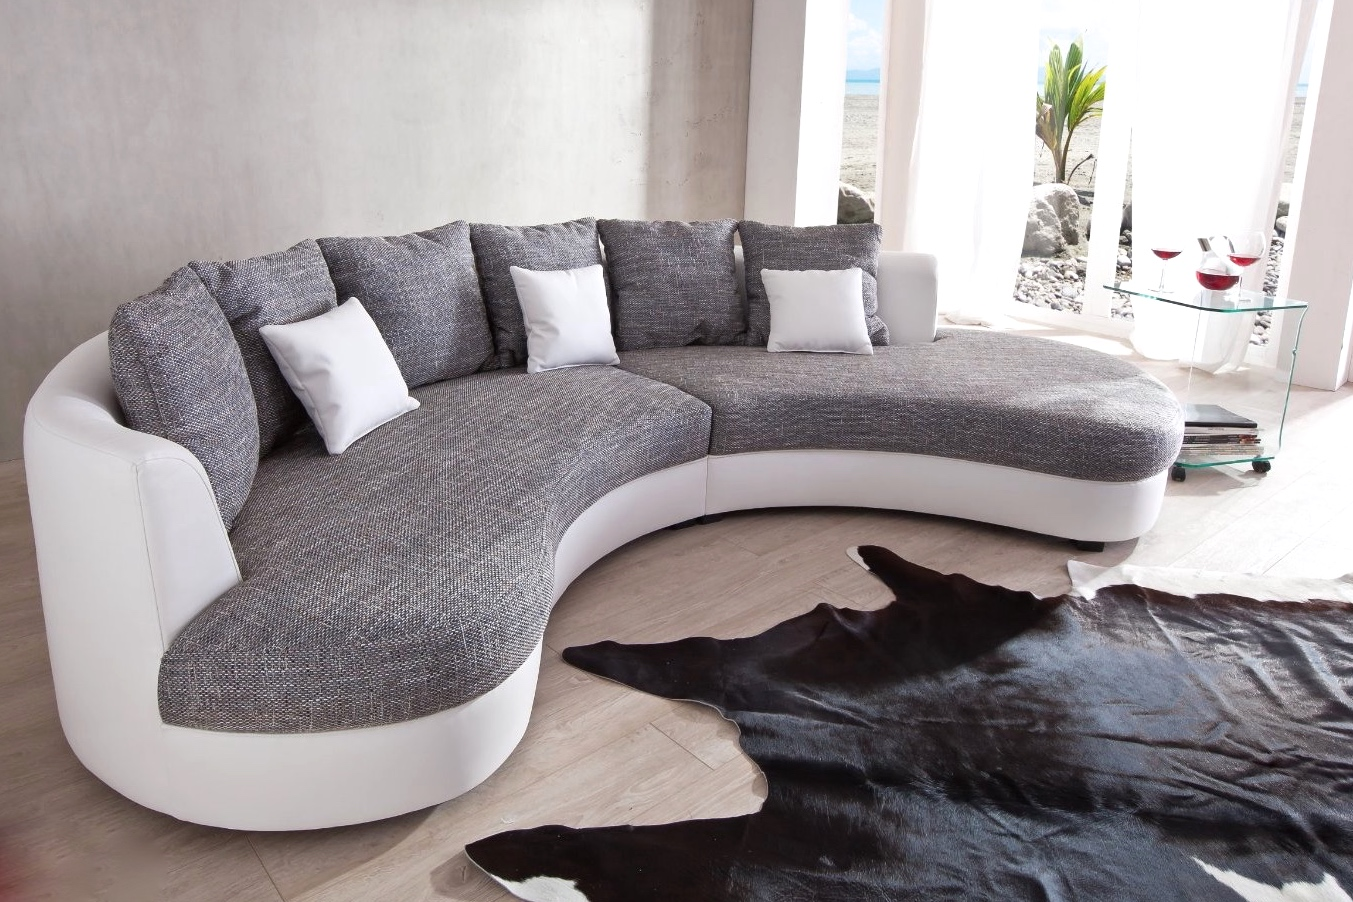 Full Size of Halbrundes Sofa Ebay Gebraucht Rot Big Klein Halbrunde Couch überzug Liege Xxl Günstig Großes Baxter Gelb Große Kissen Cassina L Form Breit Natura Schlaf Sofa Halbrundes Sofa